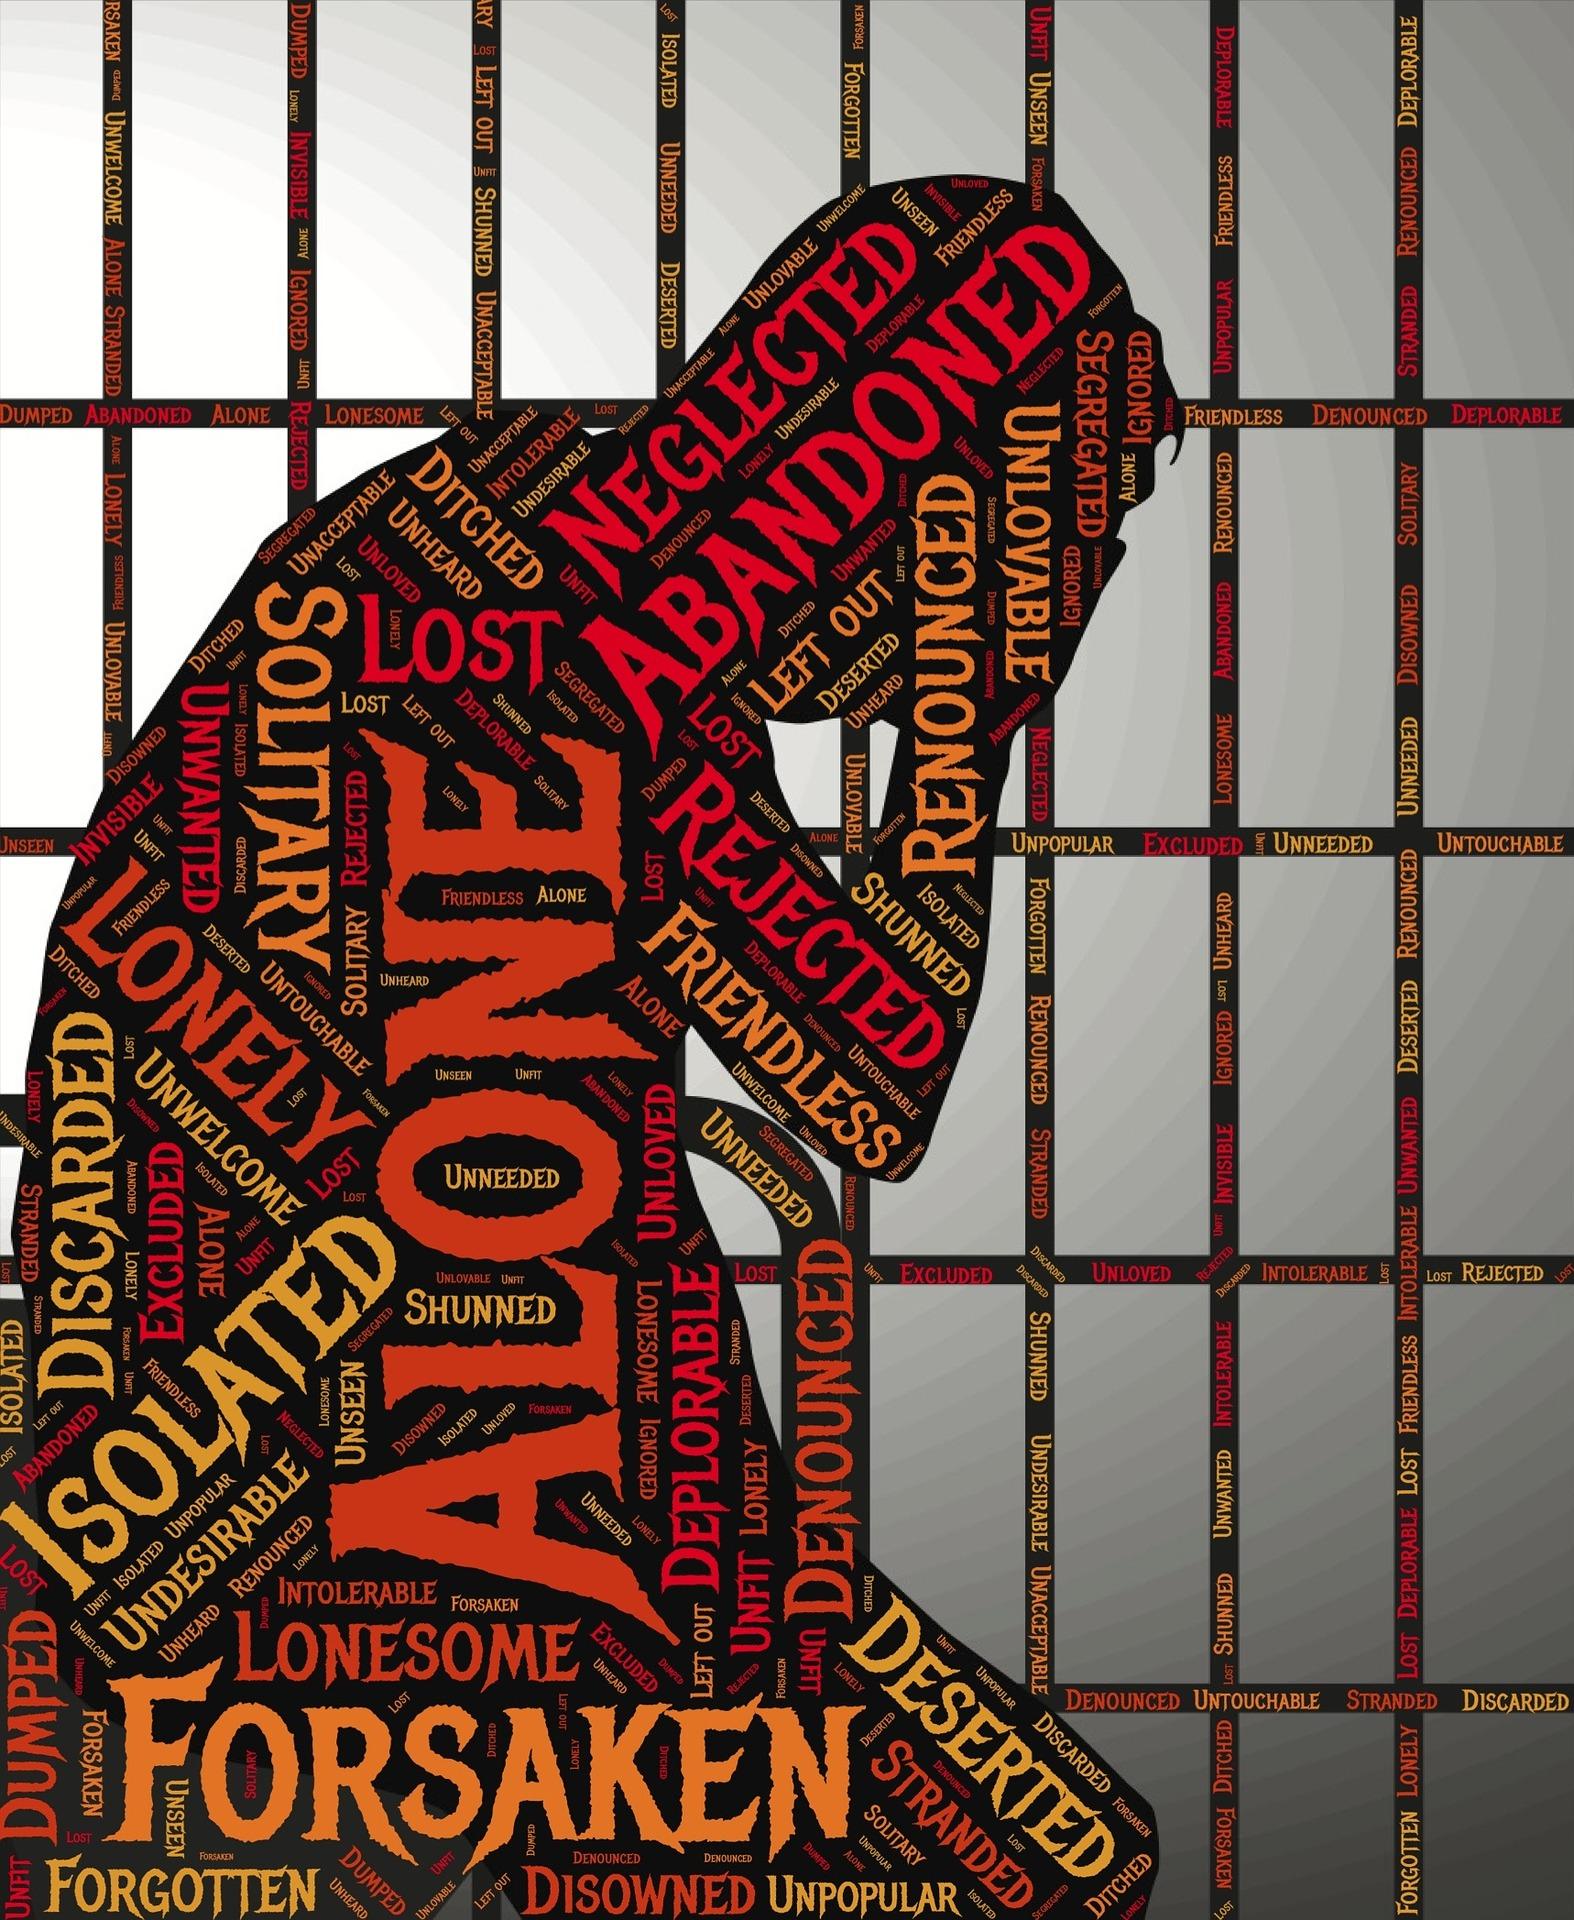 jailed-1251615_1920